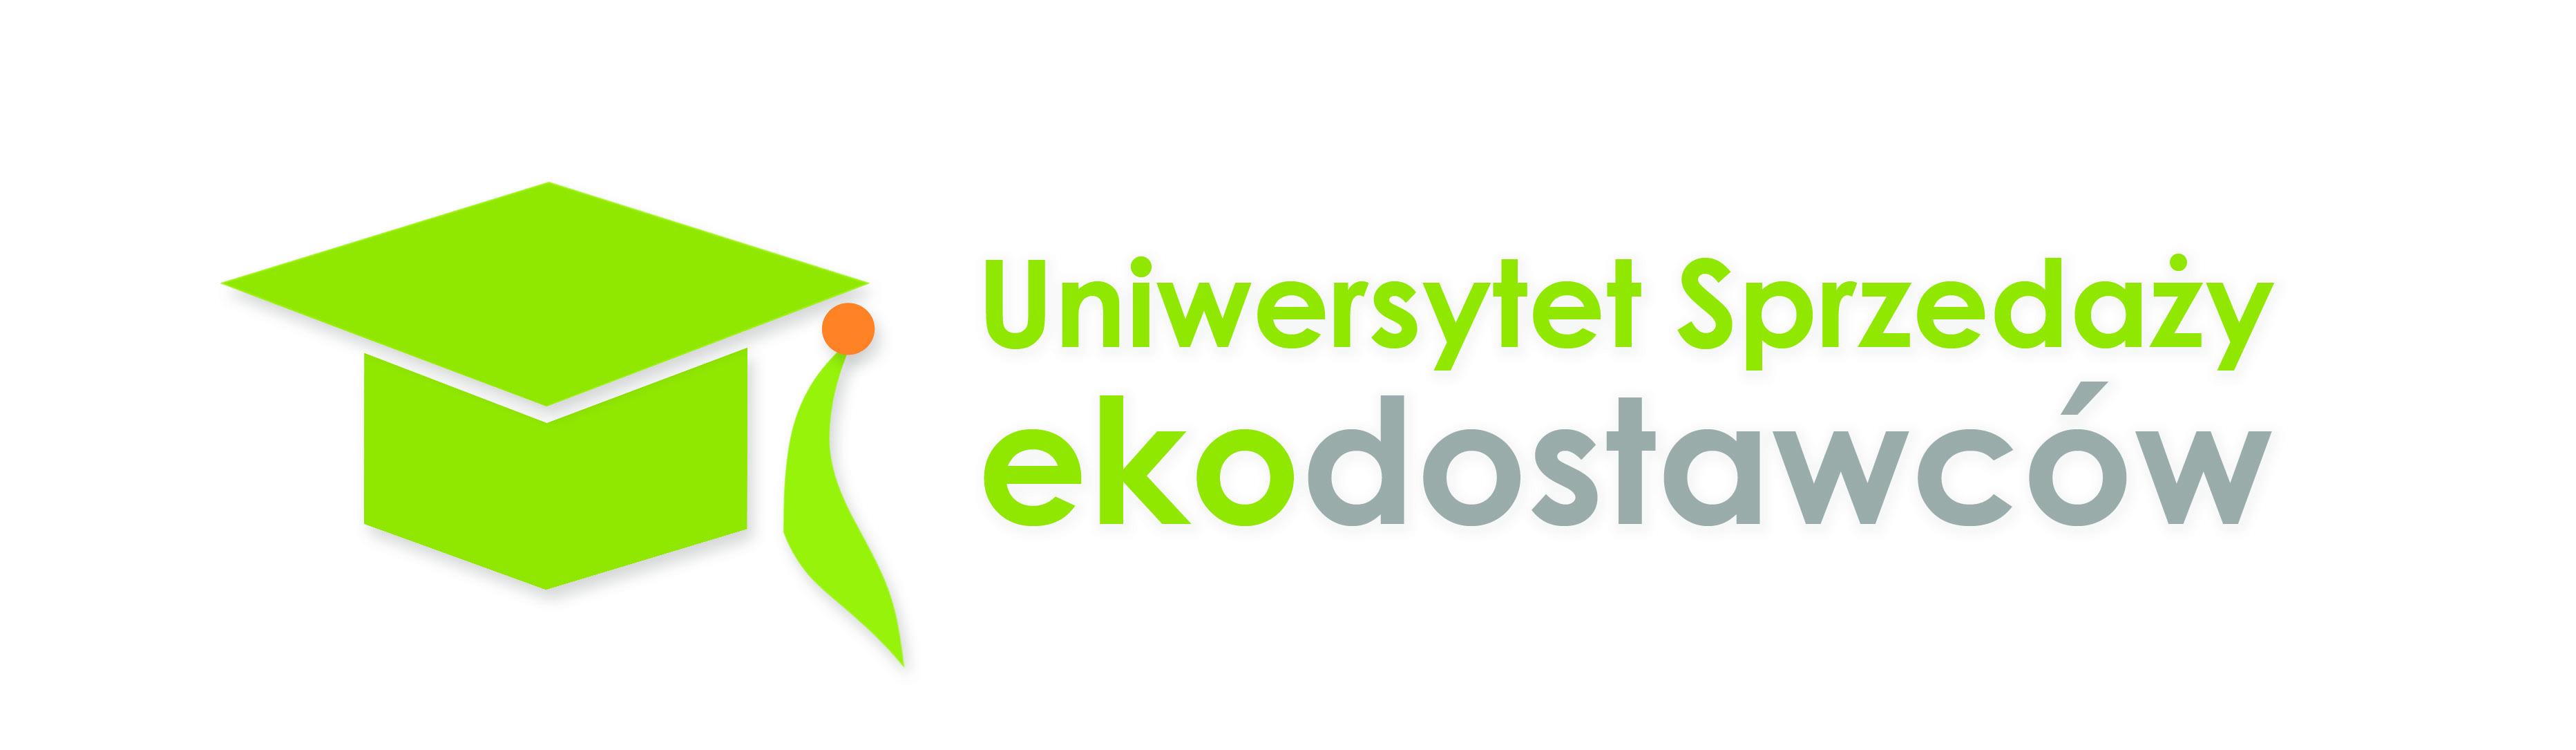 gotowe logo USE 3 (2)